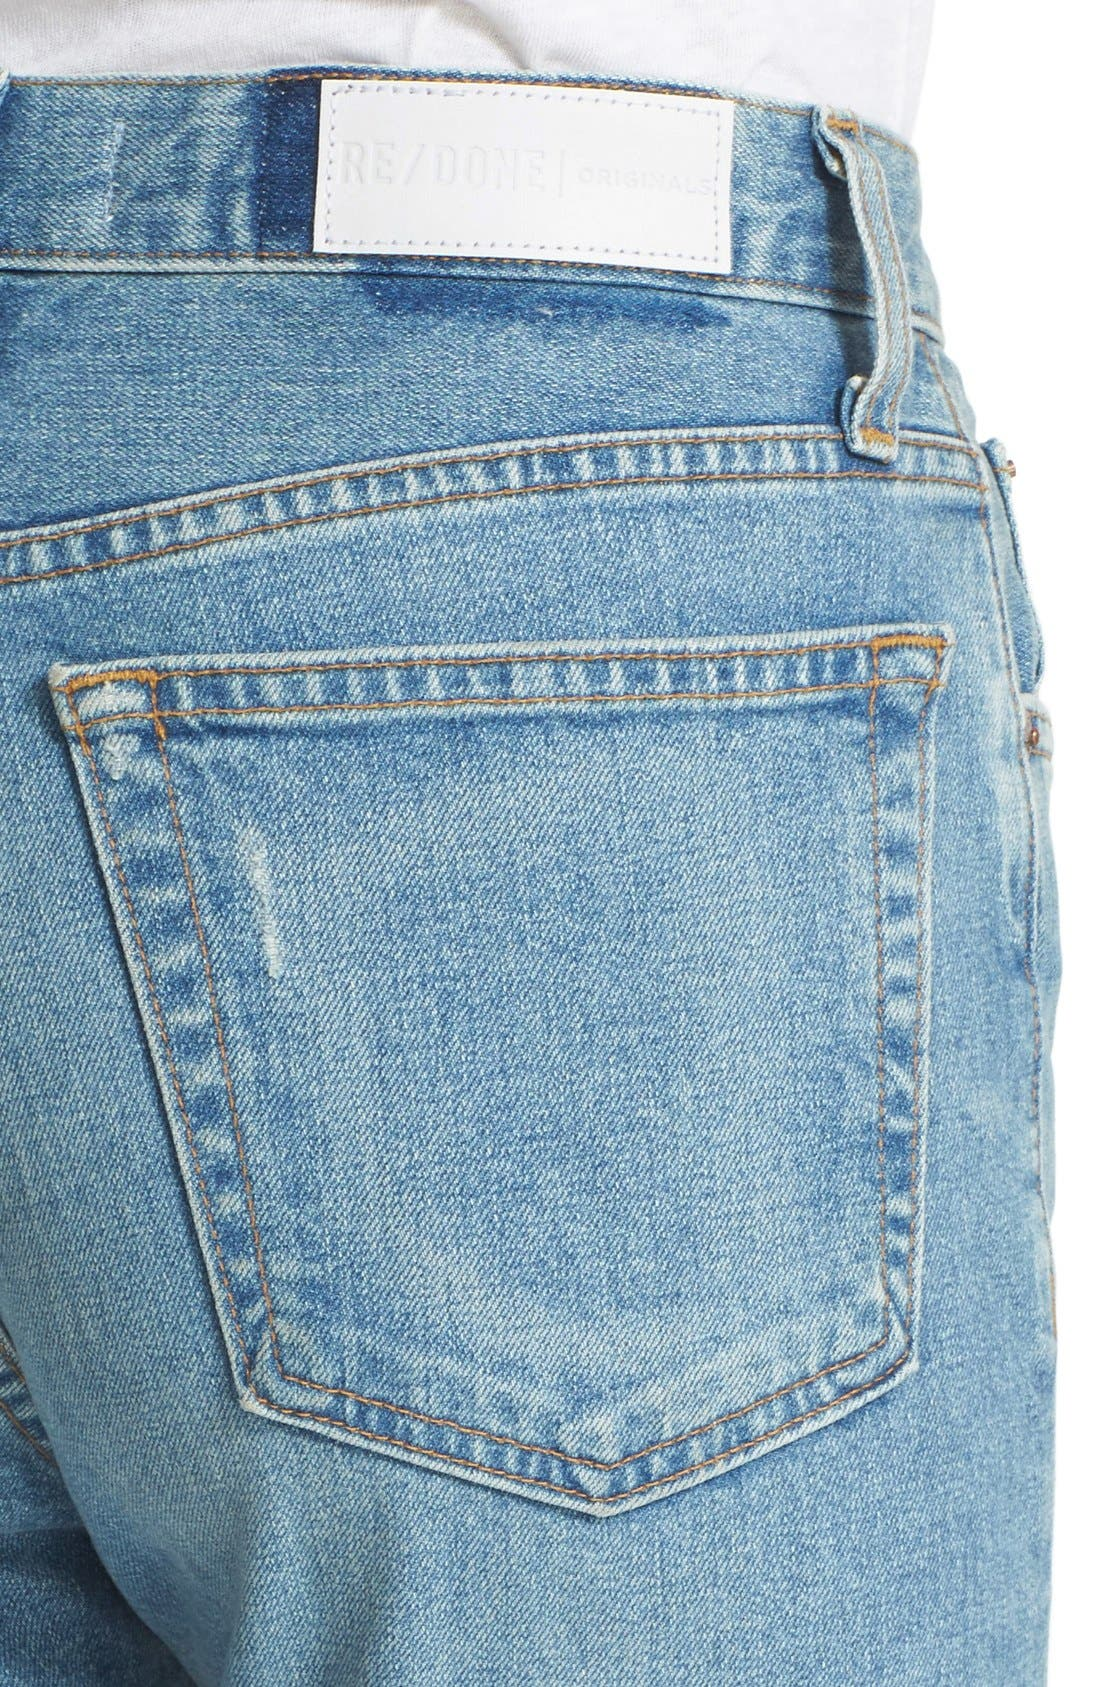 Originals High Rise Stretch Jeans,                             Alternate thumbnail 3, color,                             400